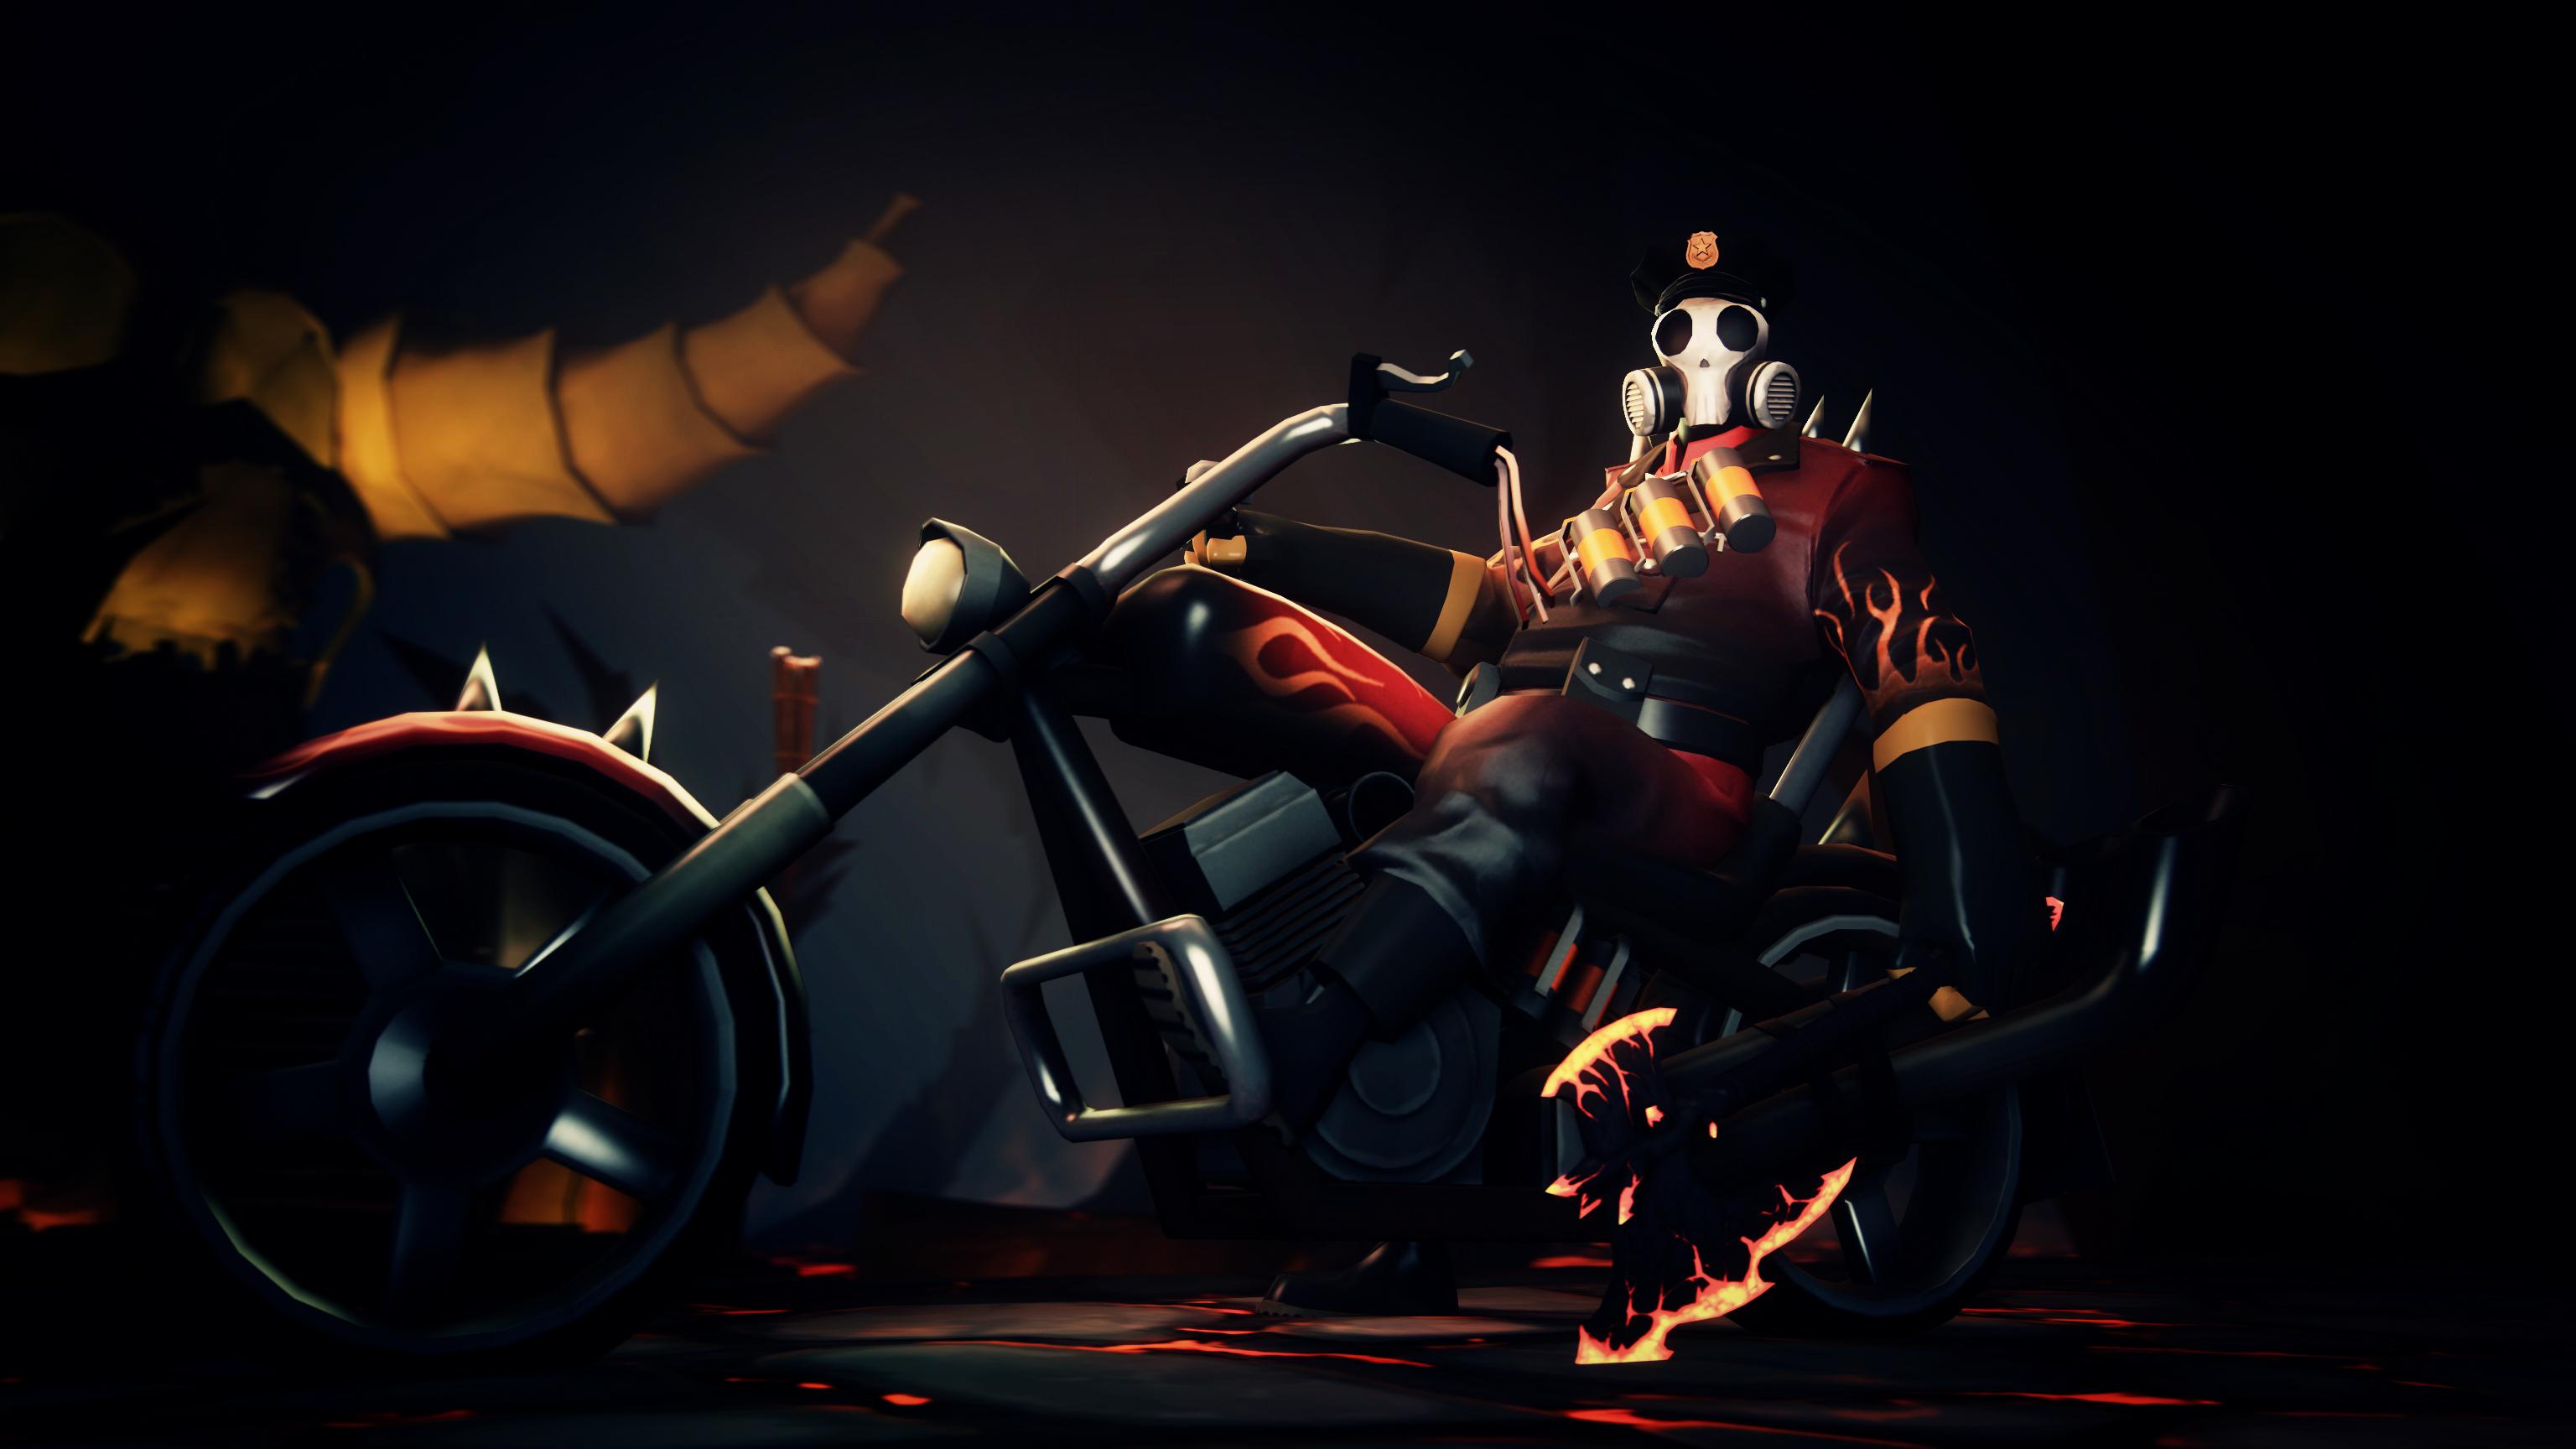 Rider by PsychoLinChan